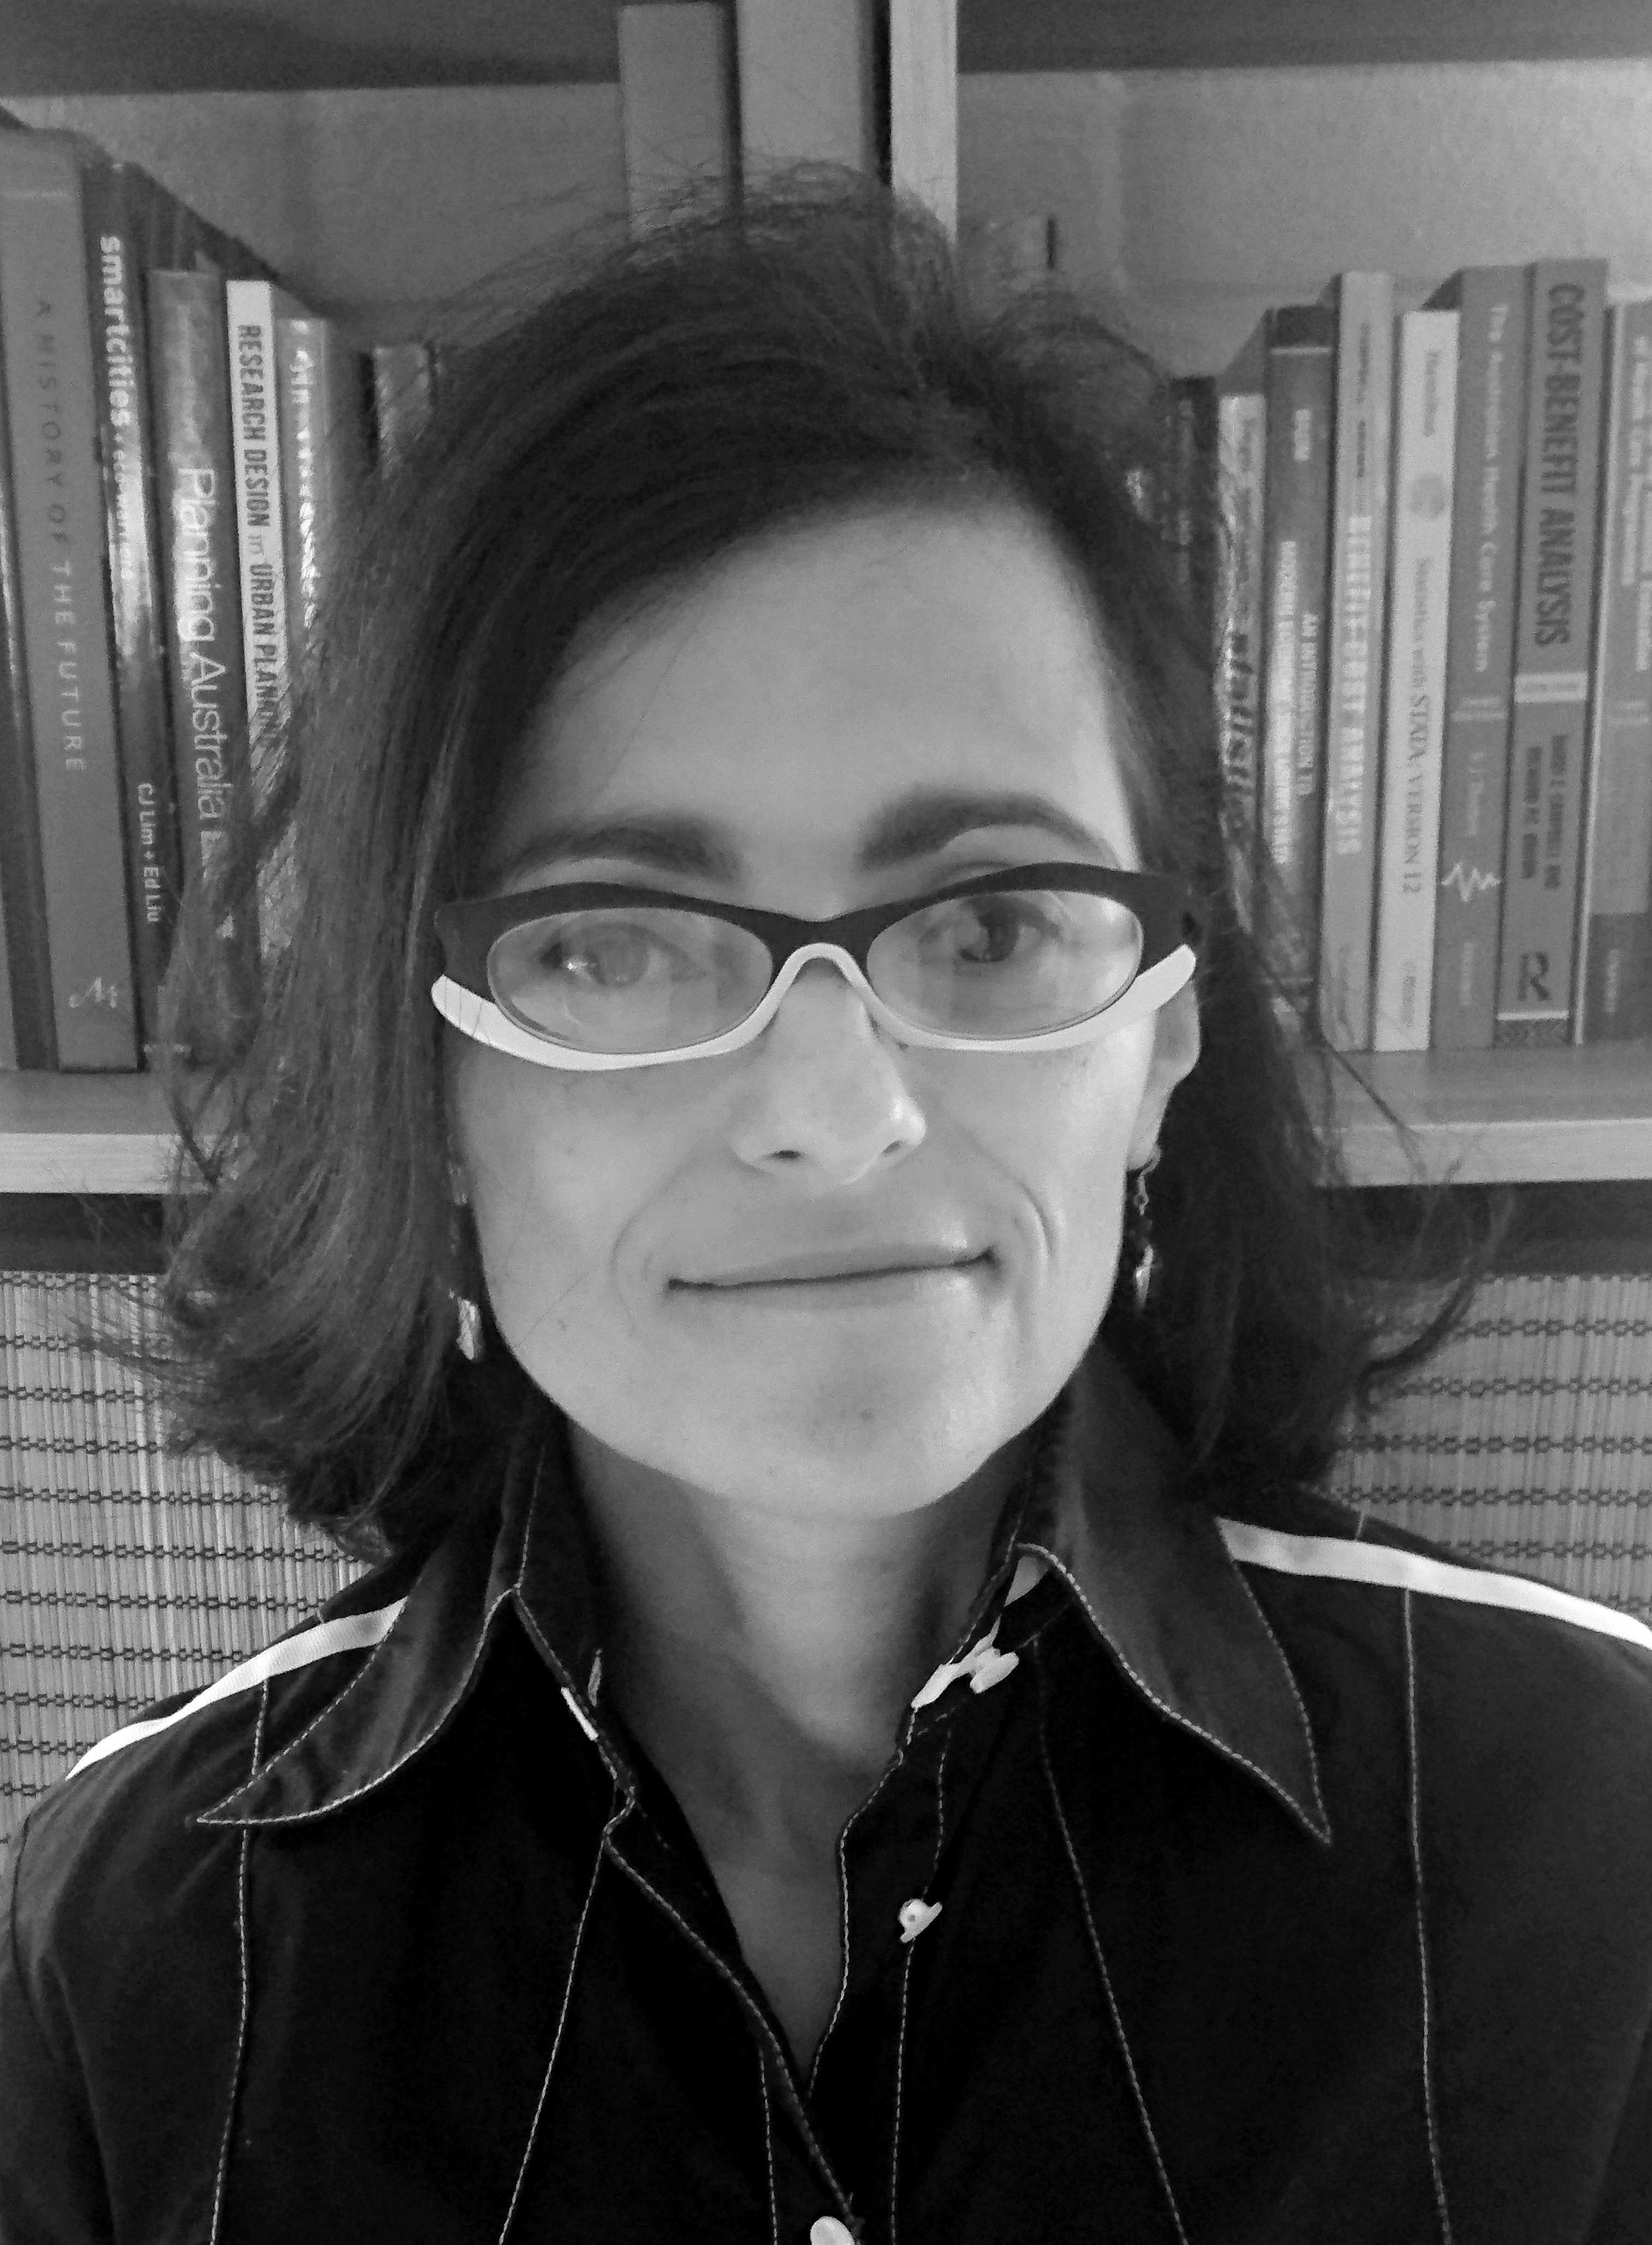 Dr. Eliana Jimenez Soto, experienced Health Economist